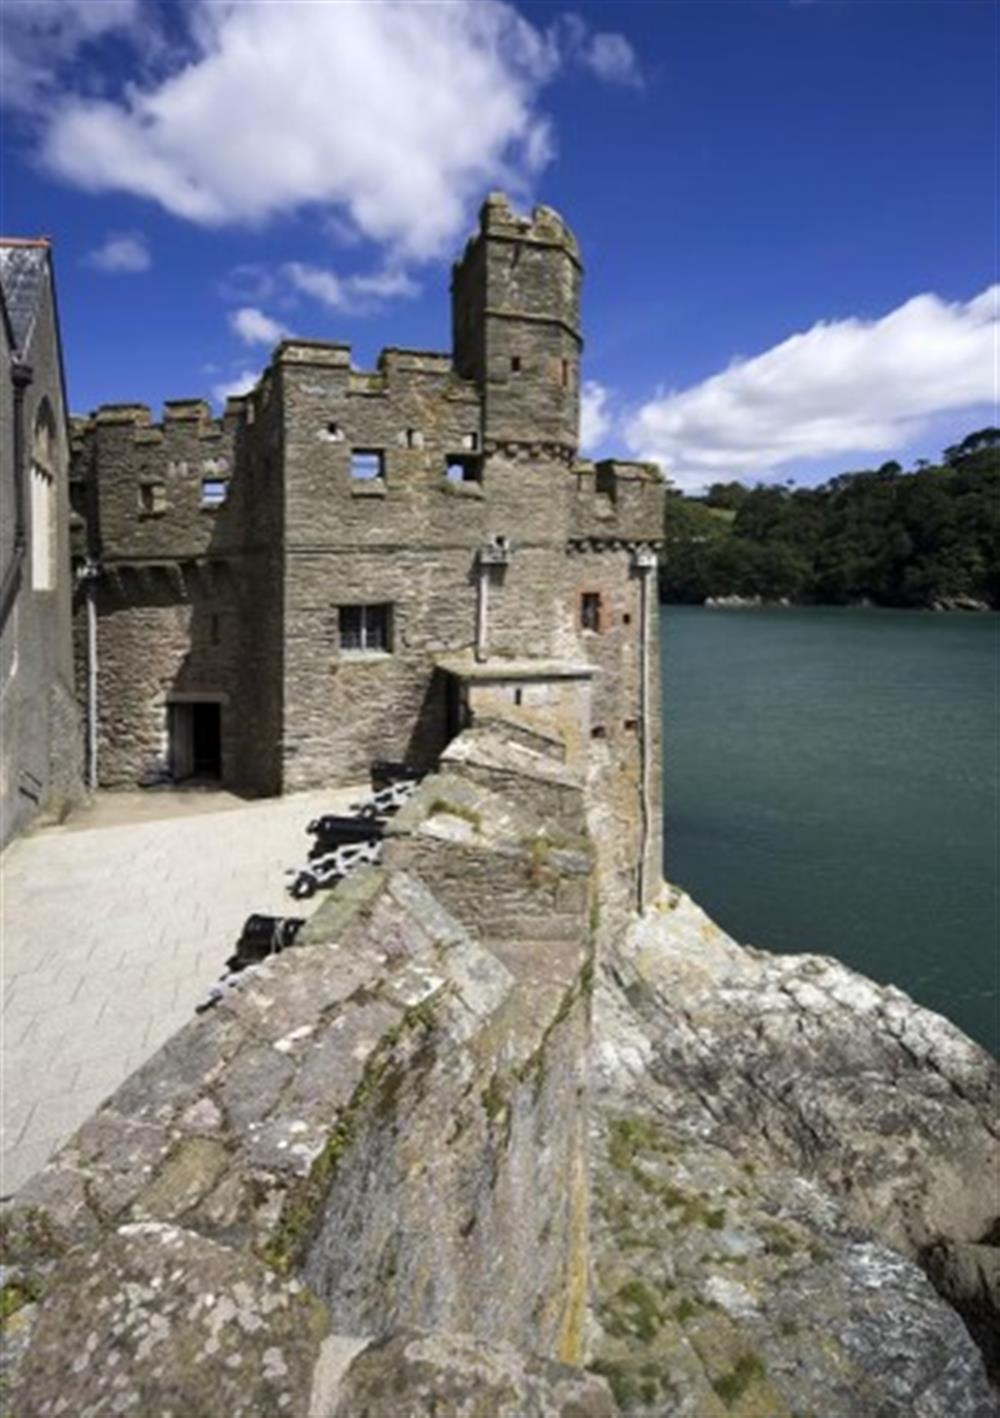 Dartmouth Castle at 2A Mayflower Court, Dartmouth